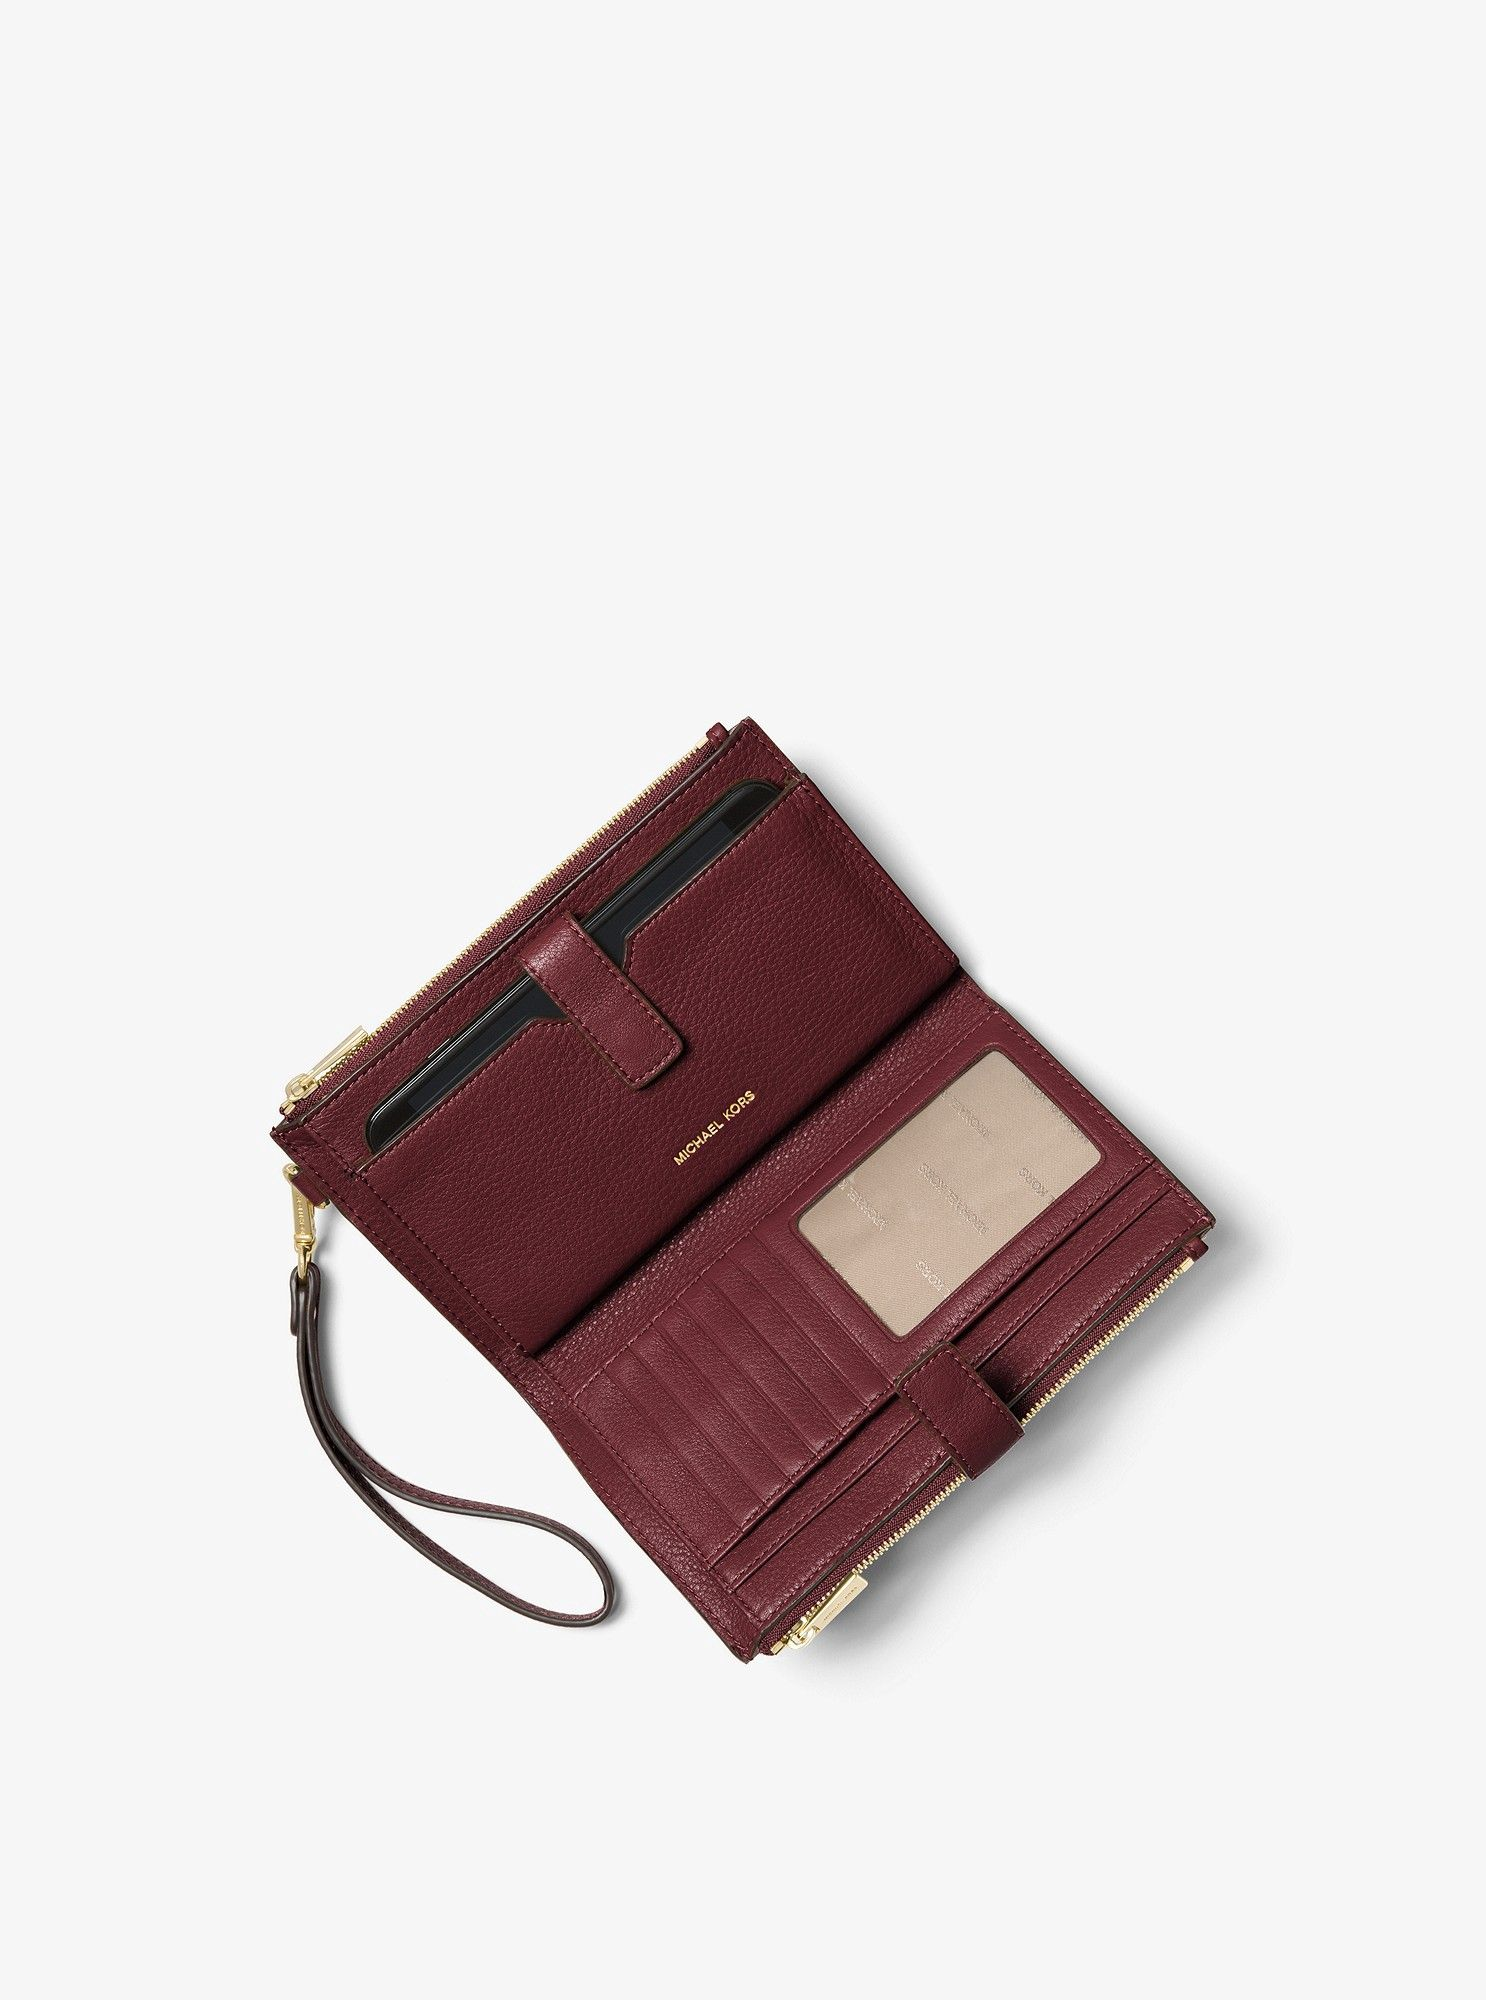 90e9fccb5df035 Michael Kors Adele Leather Smartphone Wristlet - Black | Products ...